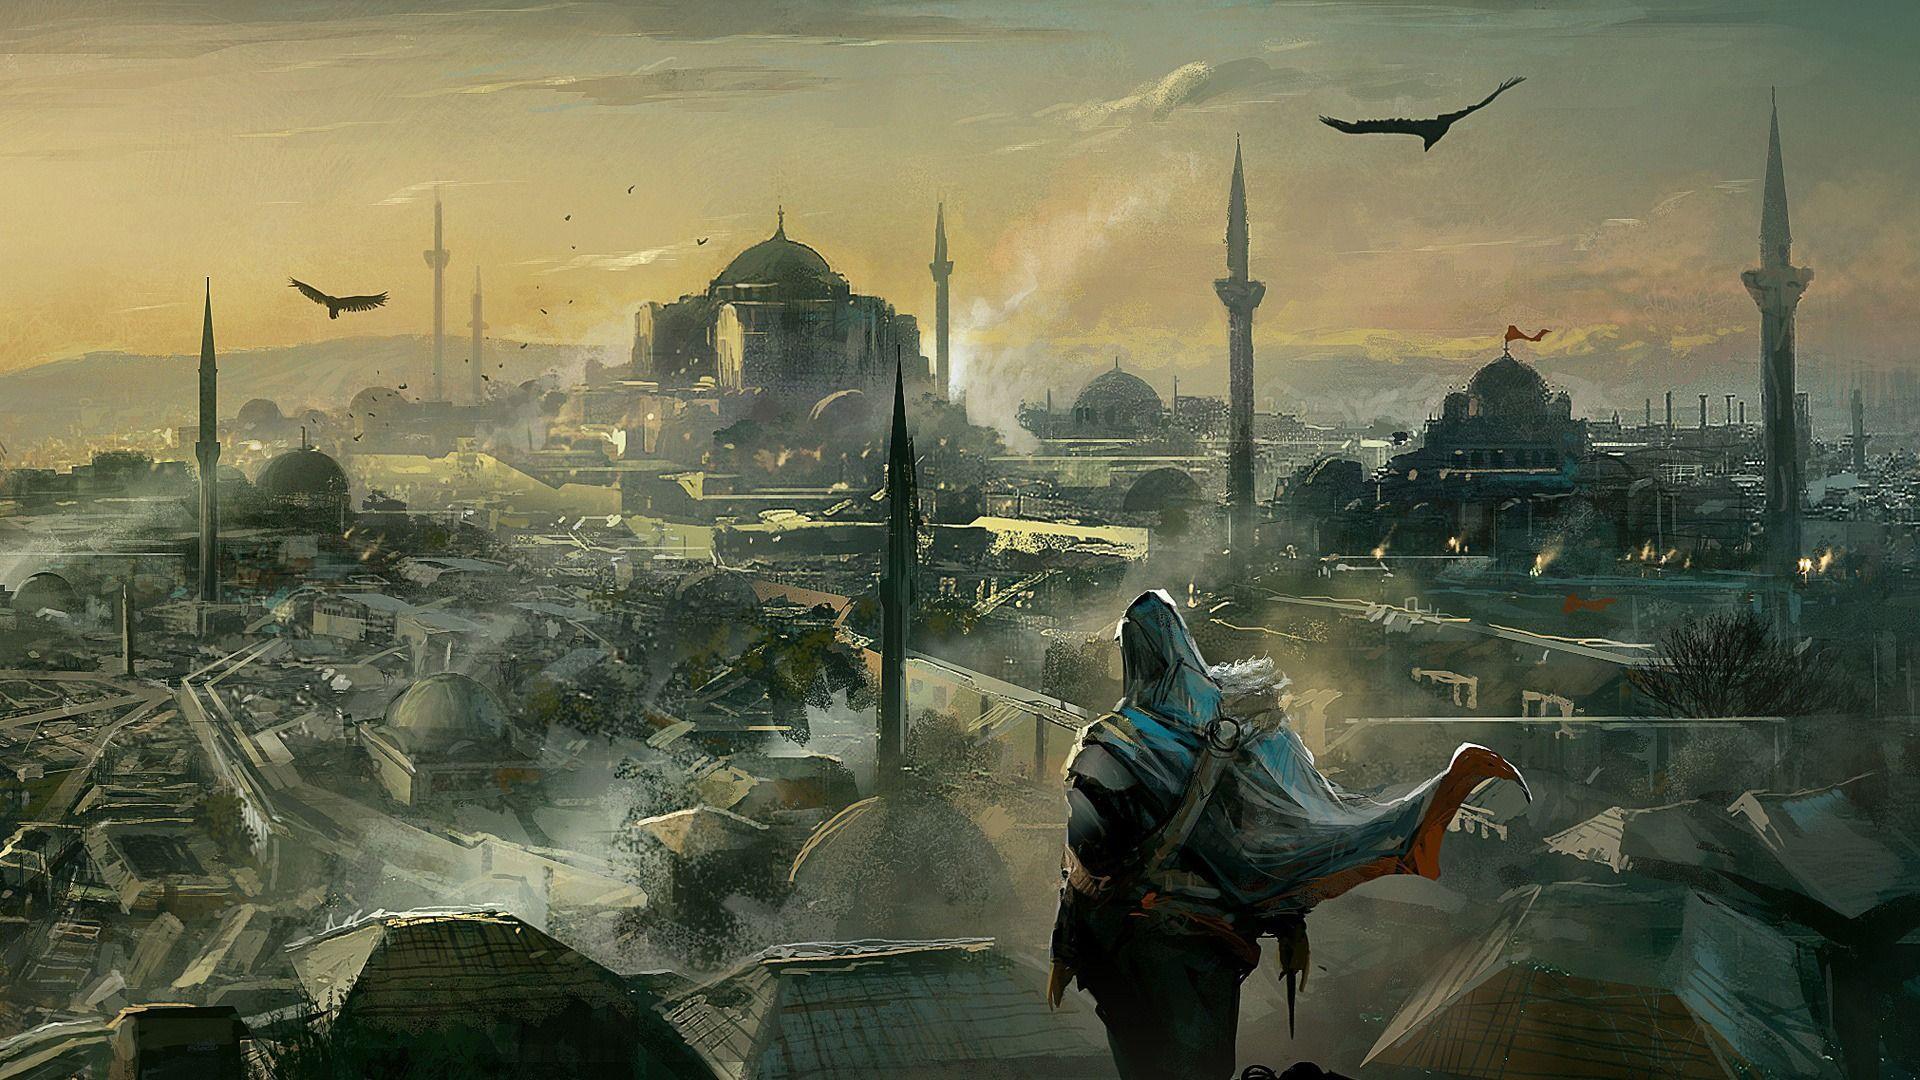 Assassins Creed Wallpaper 1080p: Assassins Creed Drawing 1080p HD Wallpaper Games